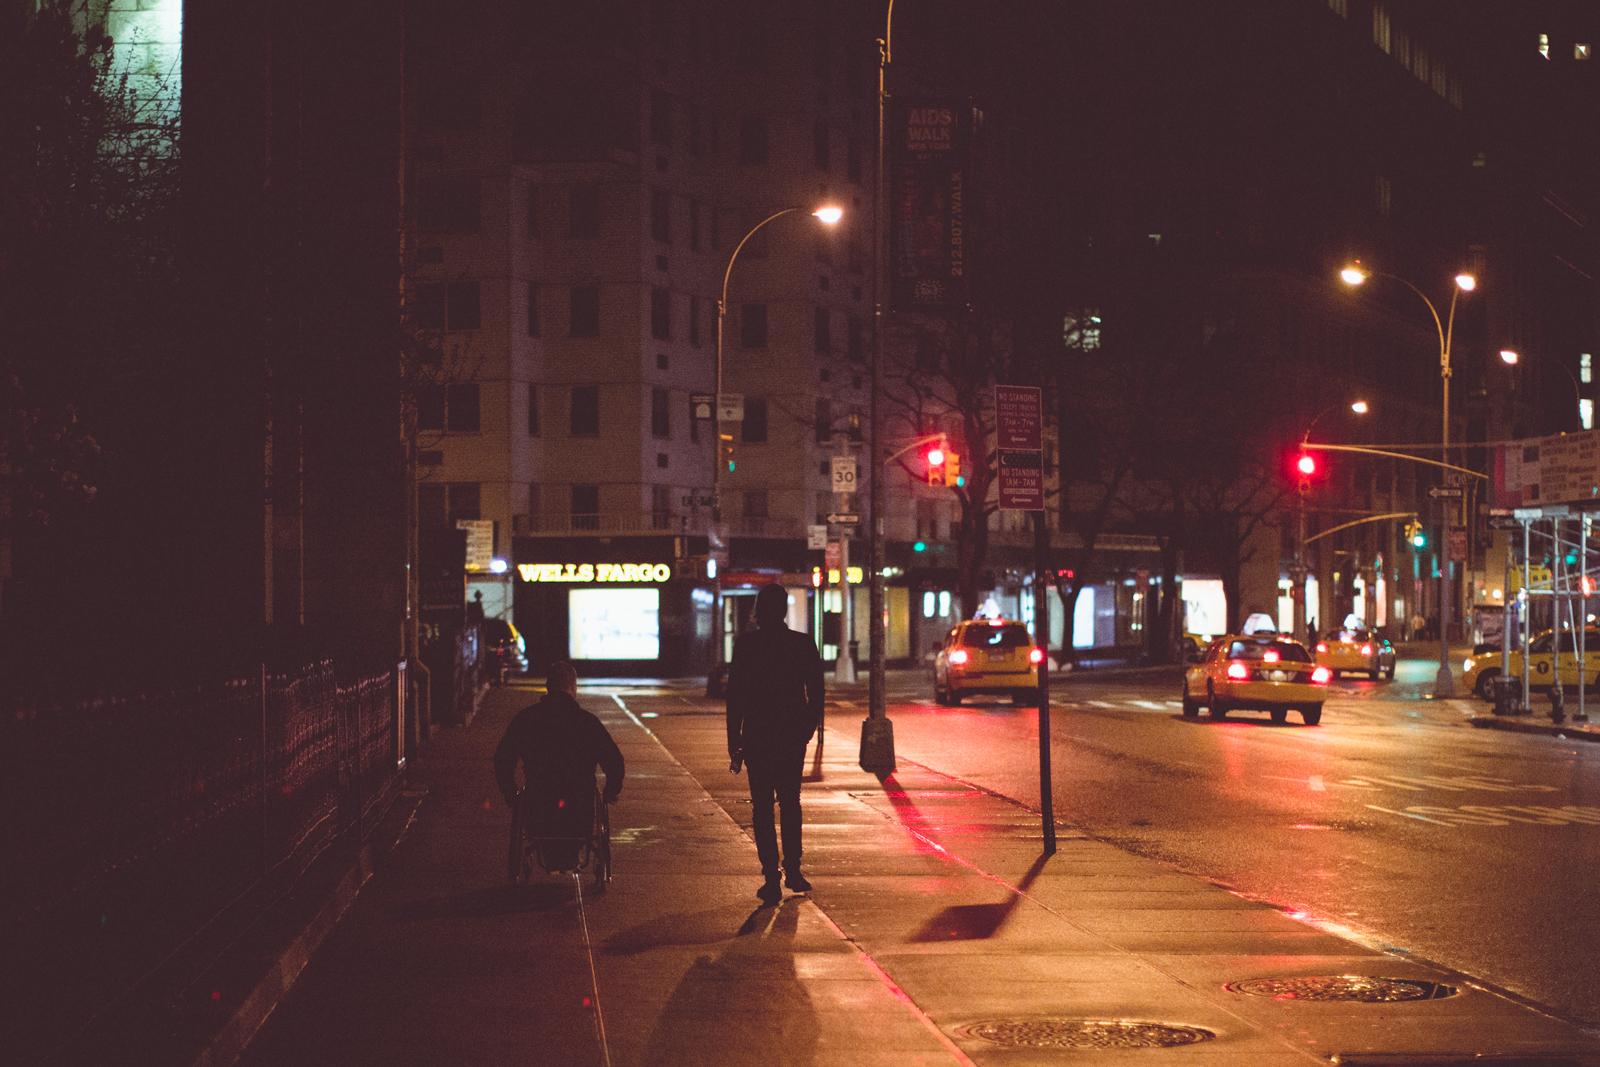 bolfo_0001s_0001_NYC Tom & C